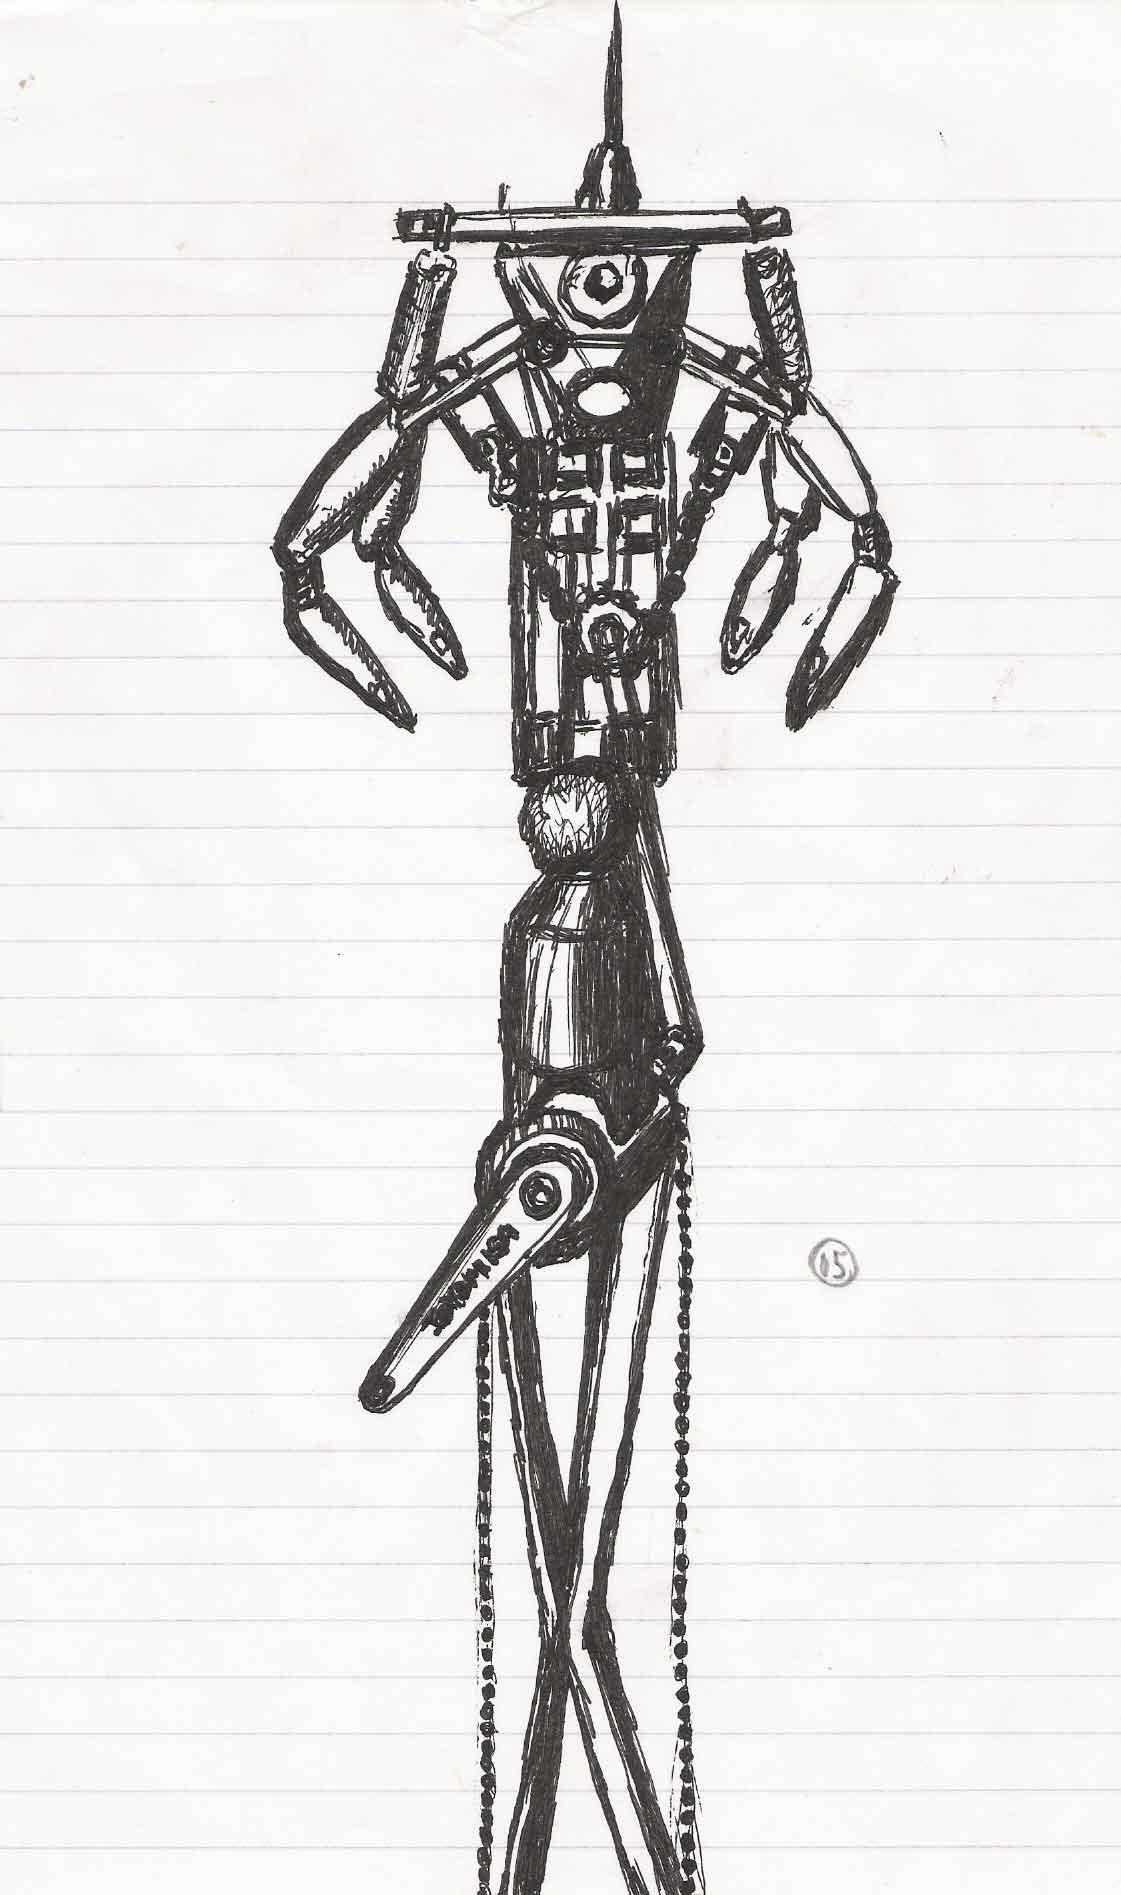 sketch-13-sept-05.jpg